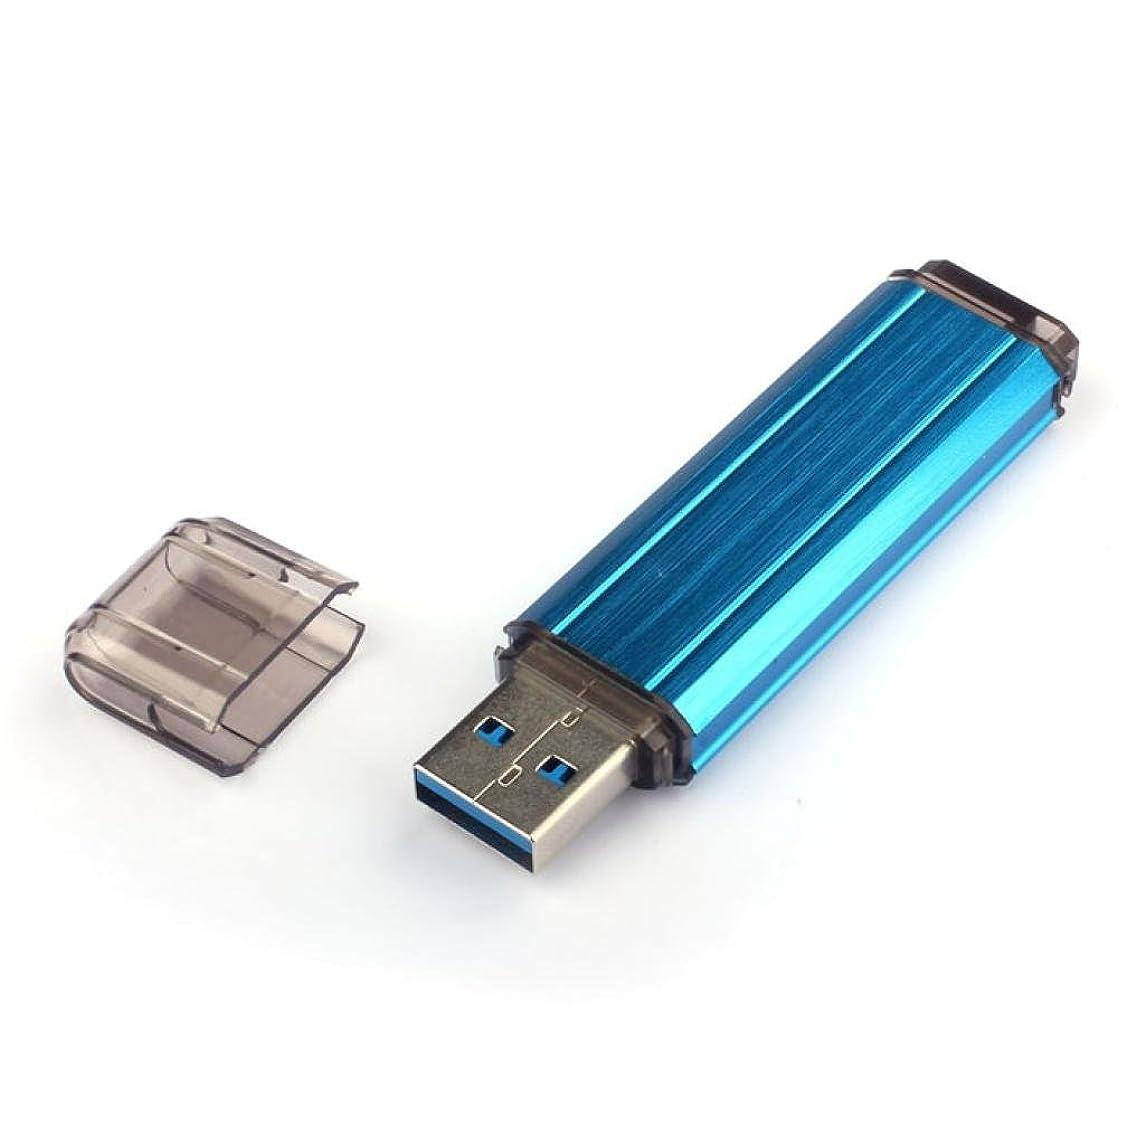 Womail 8/16/32/64/128/256GB High Speed Metal USB3.0 Flash Storage Memory Stick (256GB)